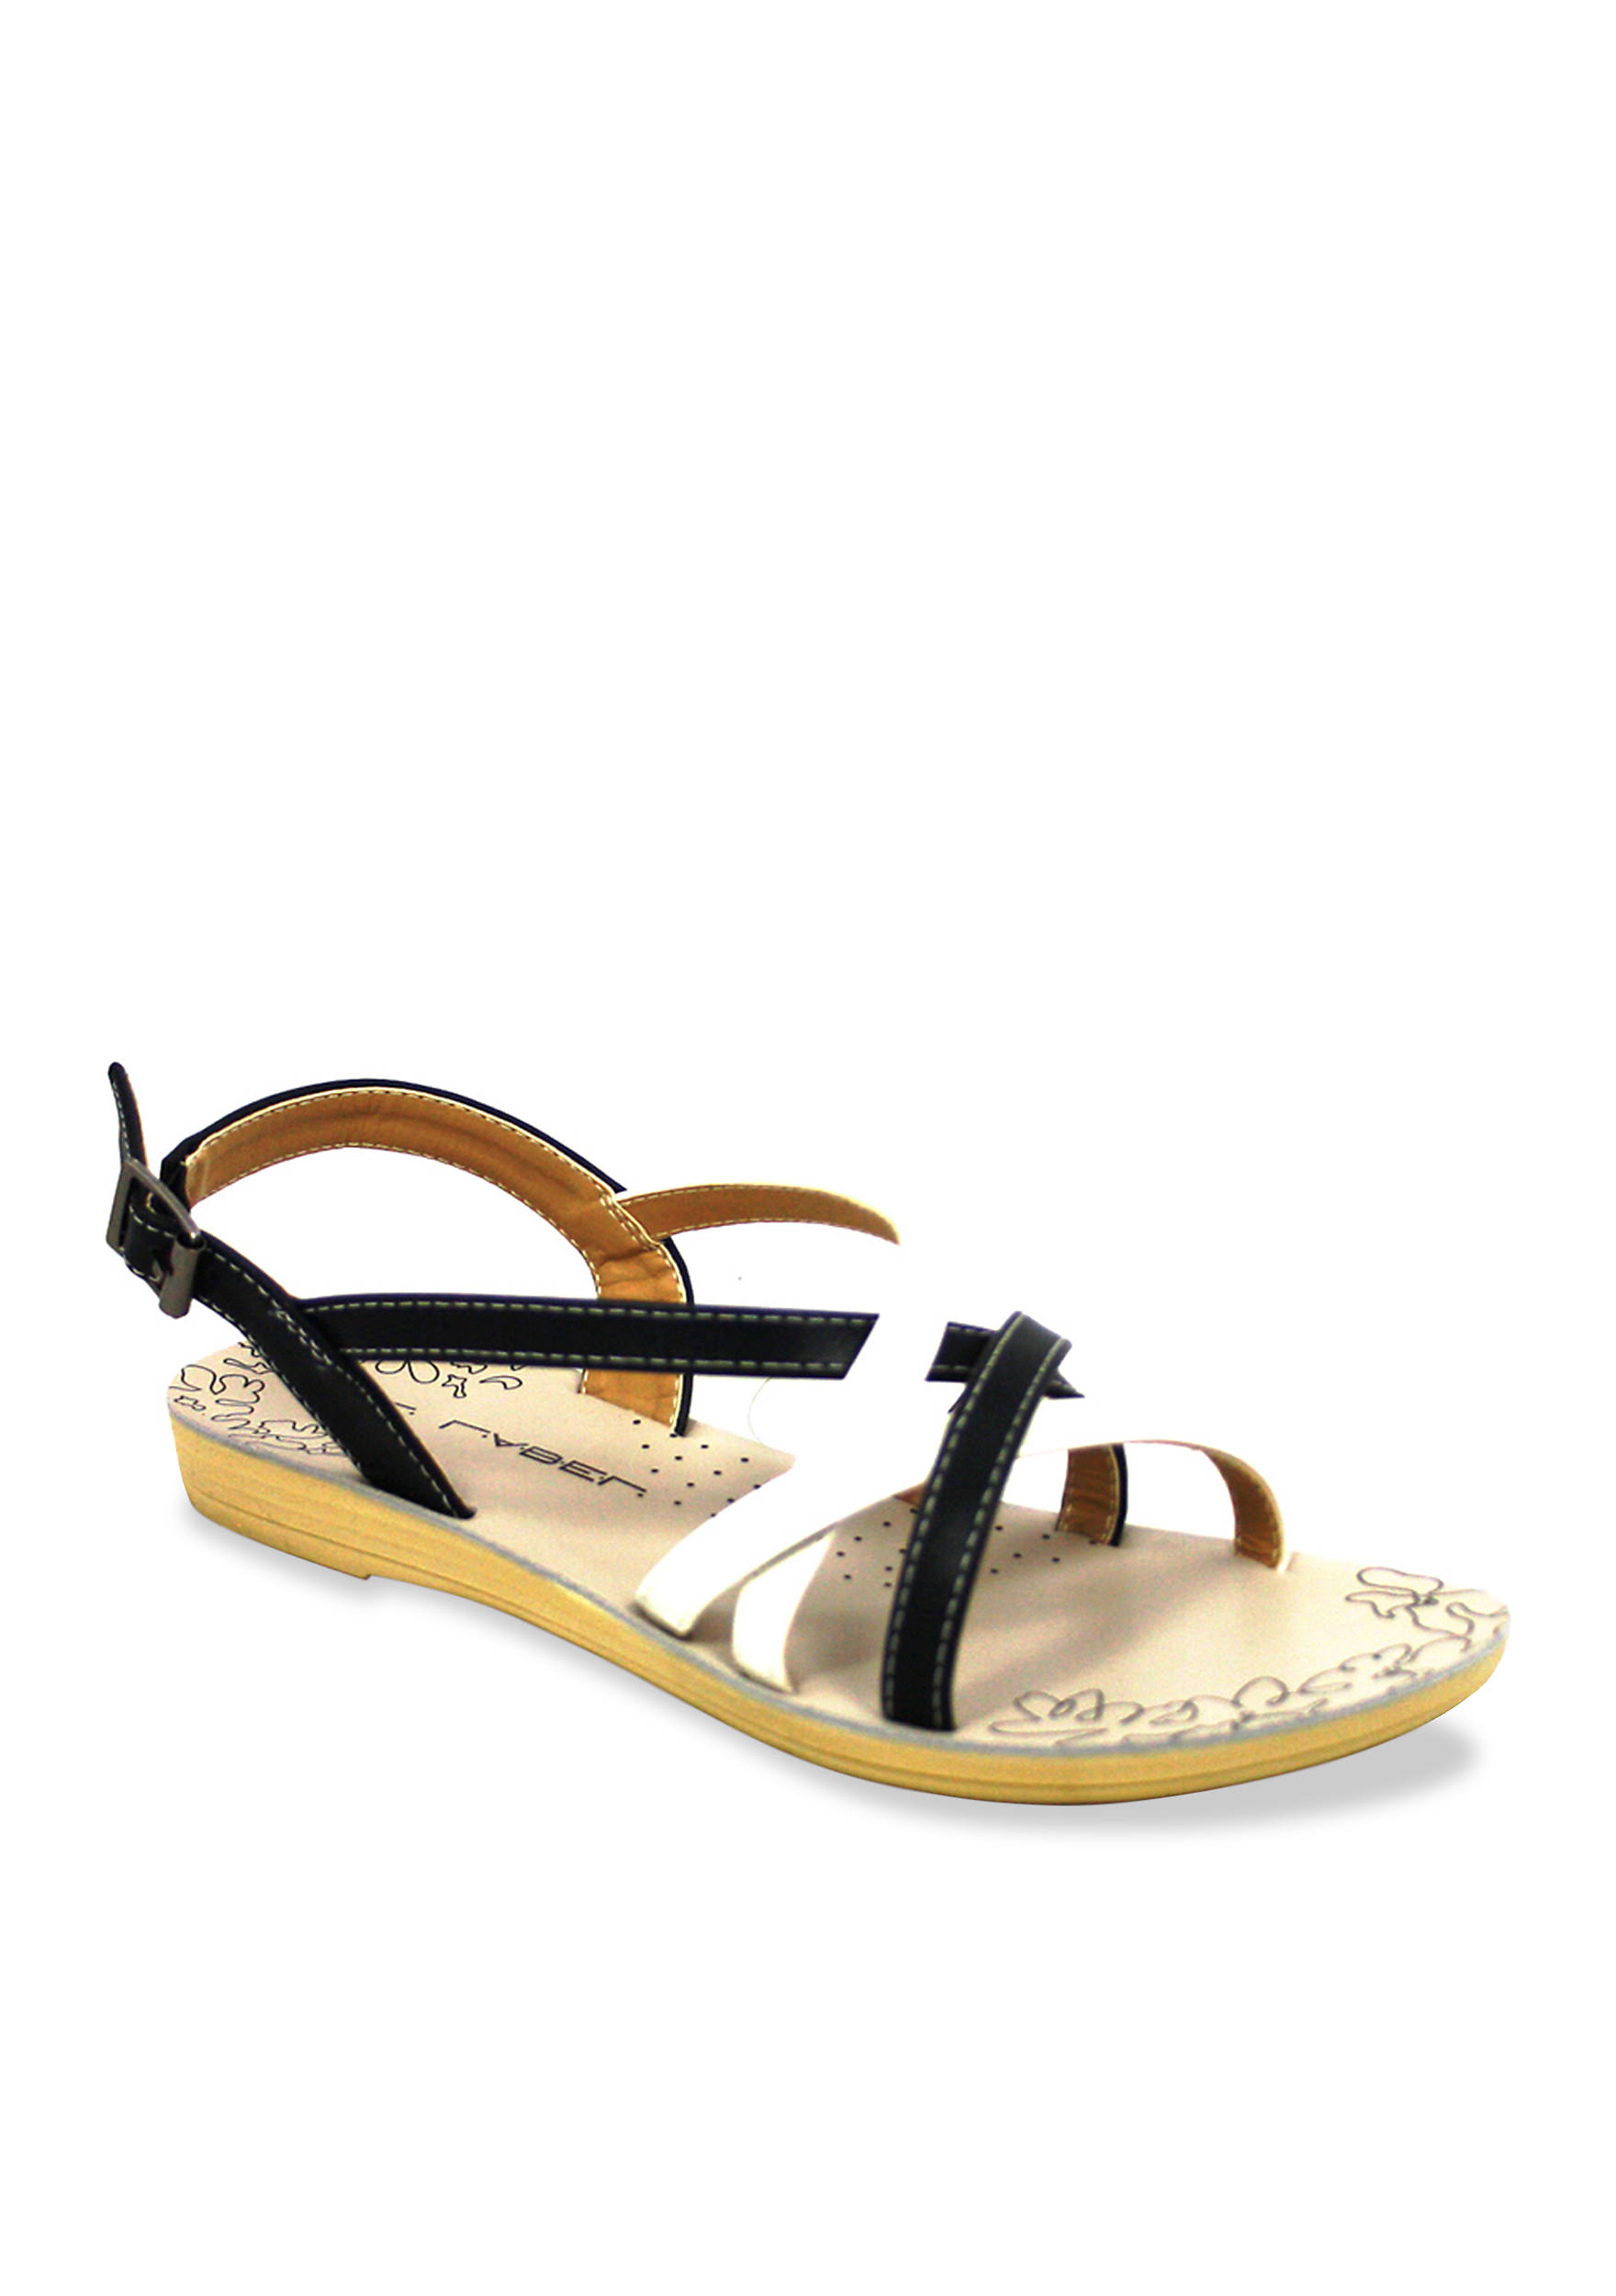 C. Label Kona Sandal. 2900760KONA20. Images